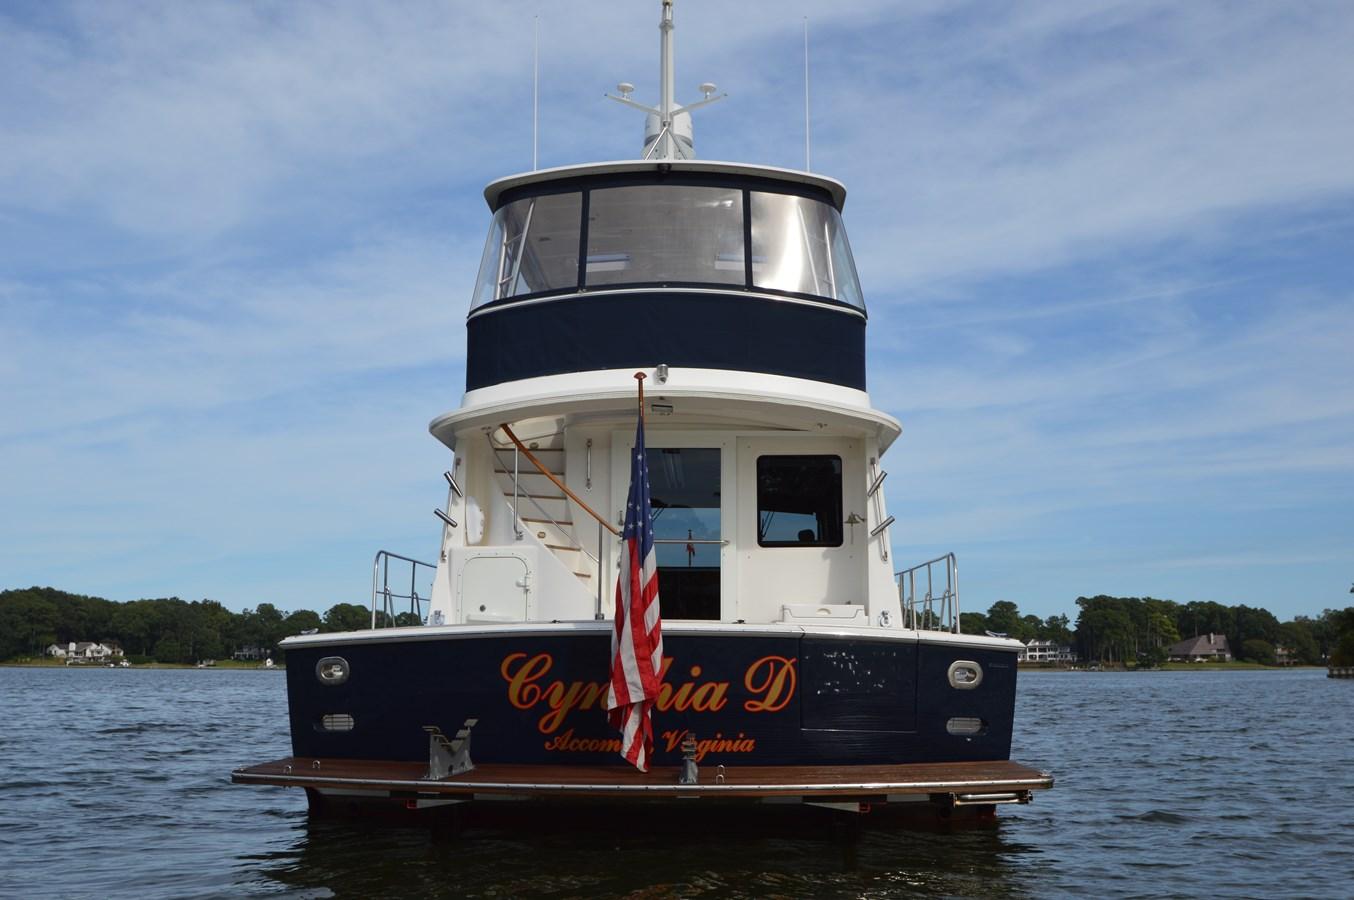 4 2004 GRAND BANKS 58 Eastbay Motor Yacht 2713661